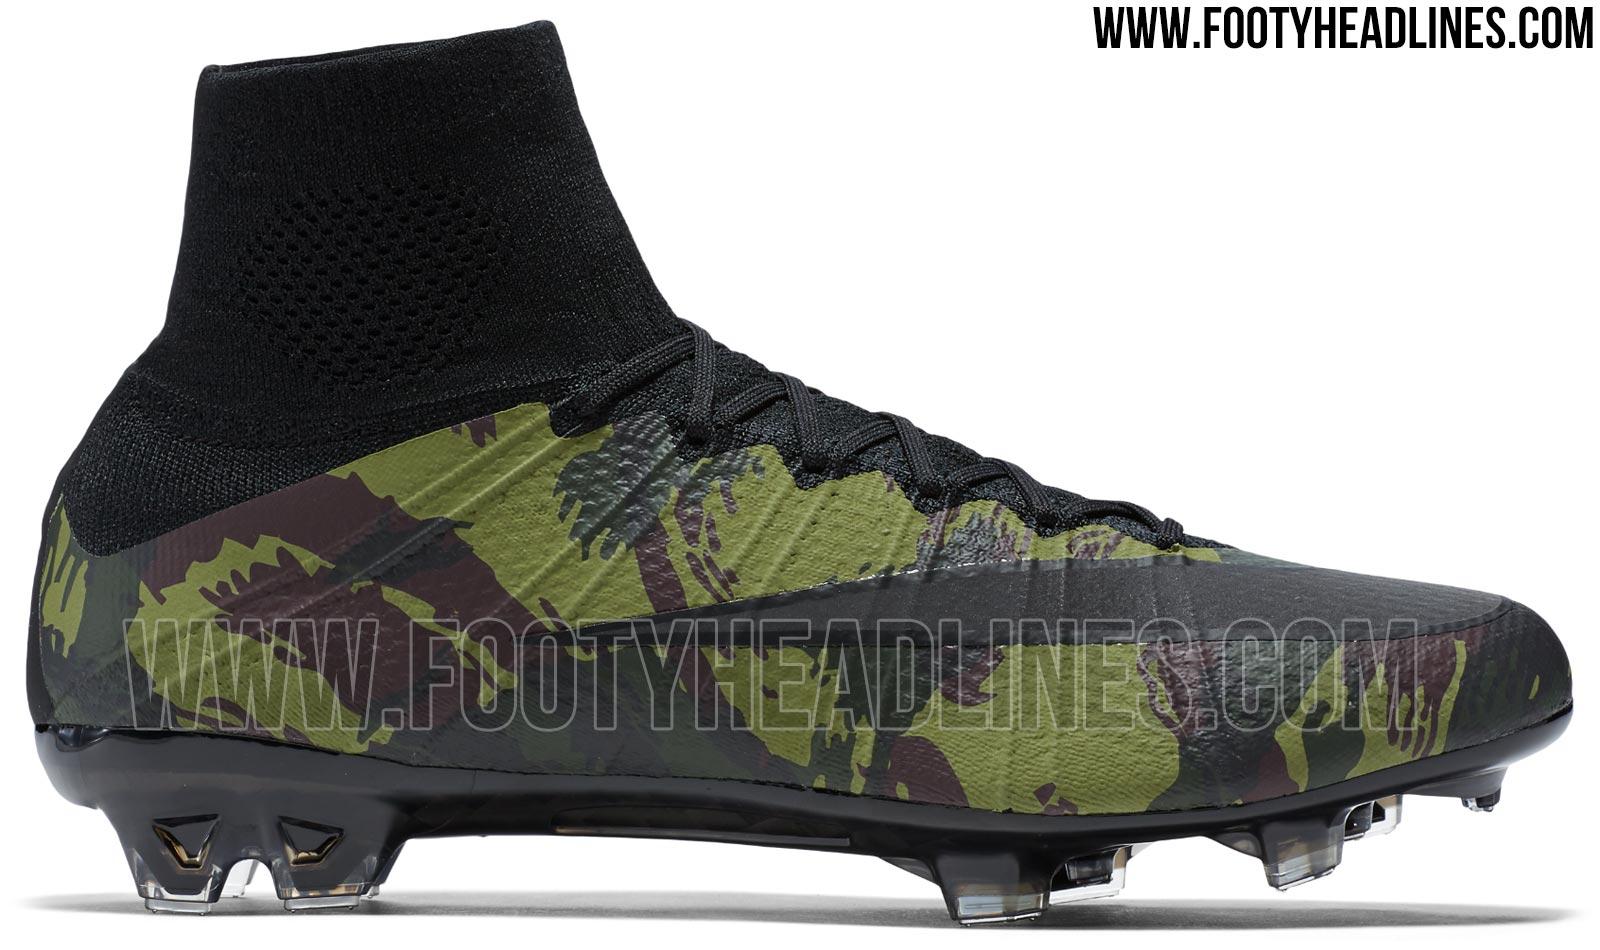 Nike Fußballschuhe Tarnmuster